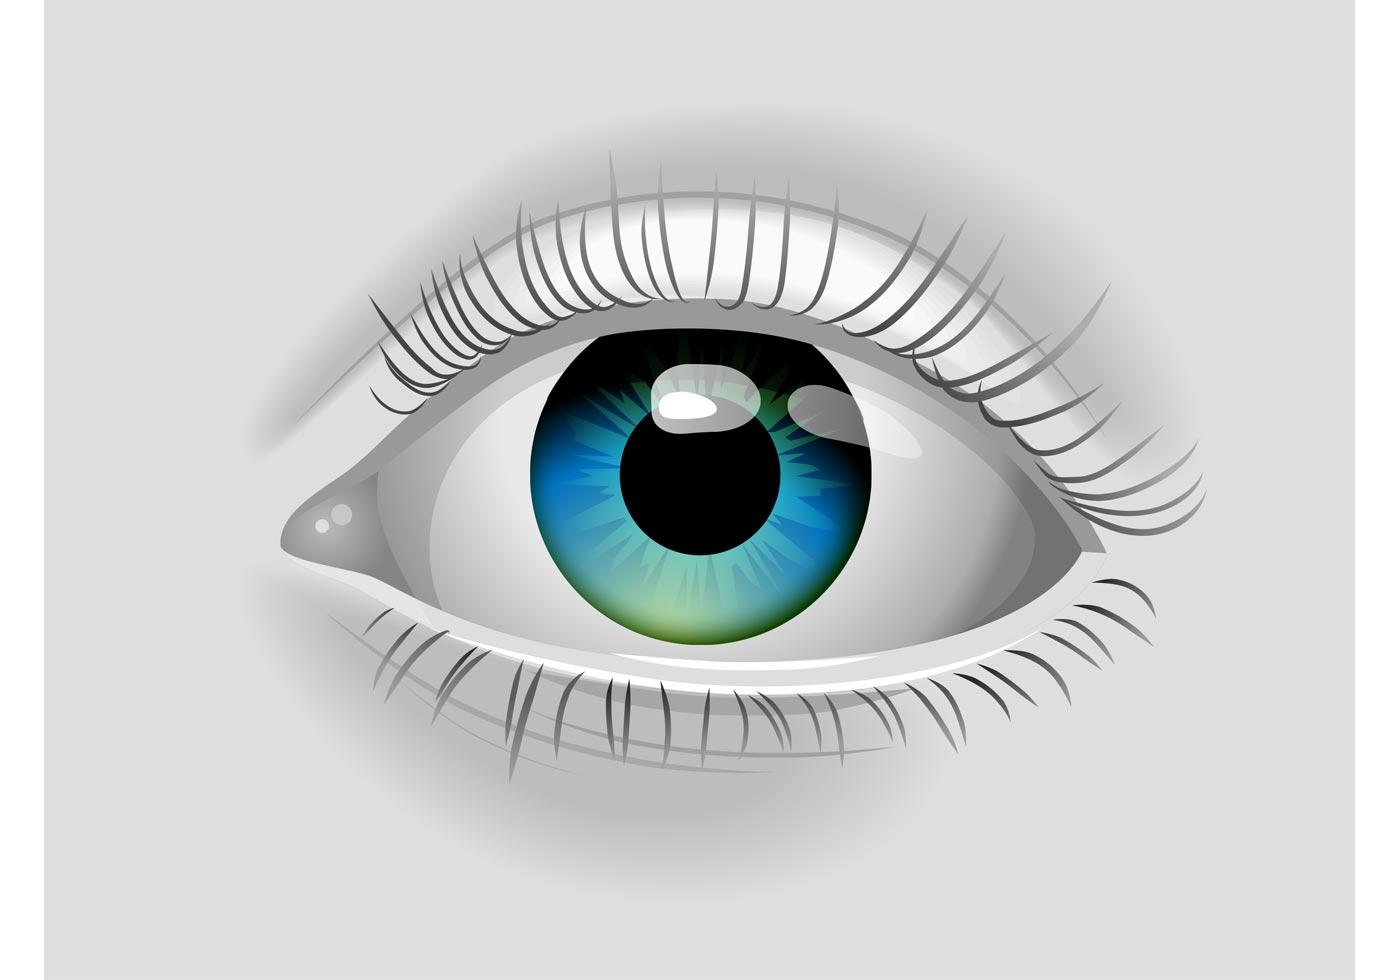 Realistic Vector Eye - Download Free Vector Art, Stock ...